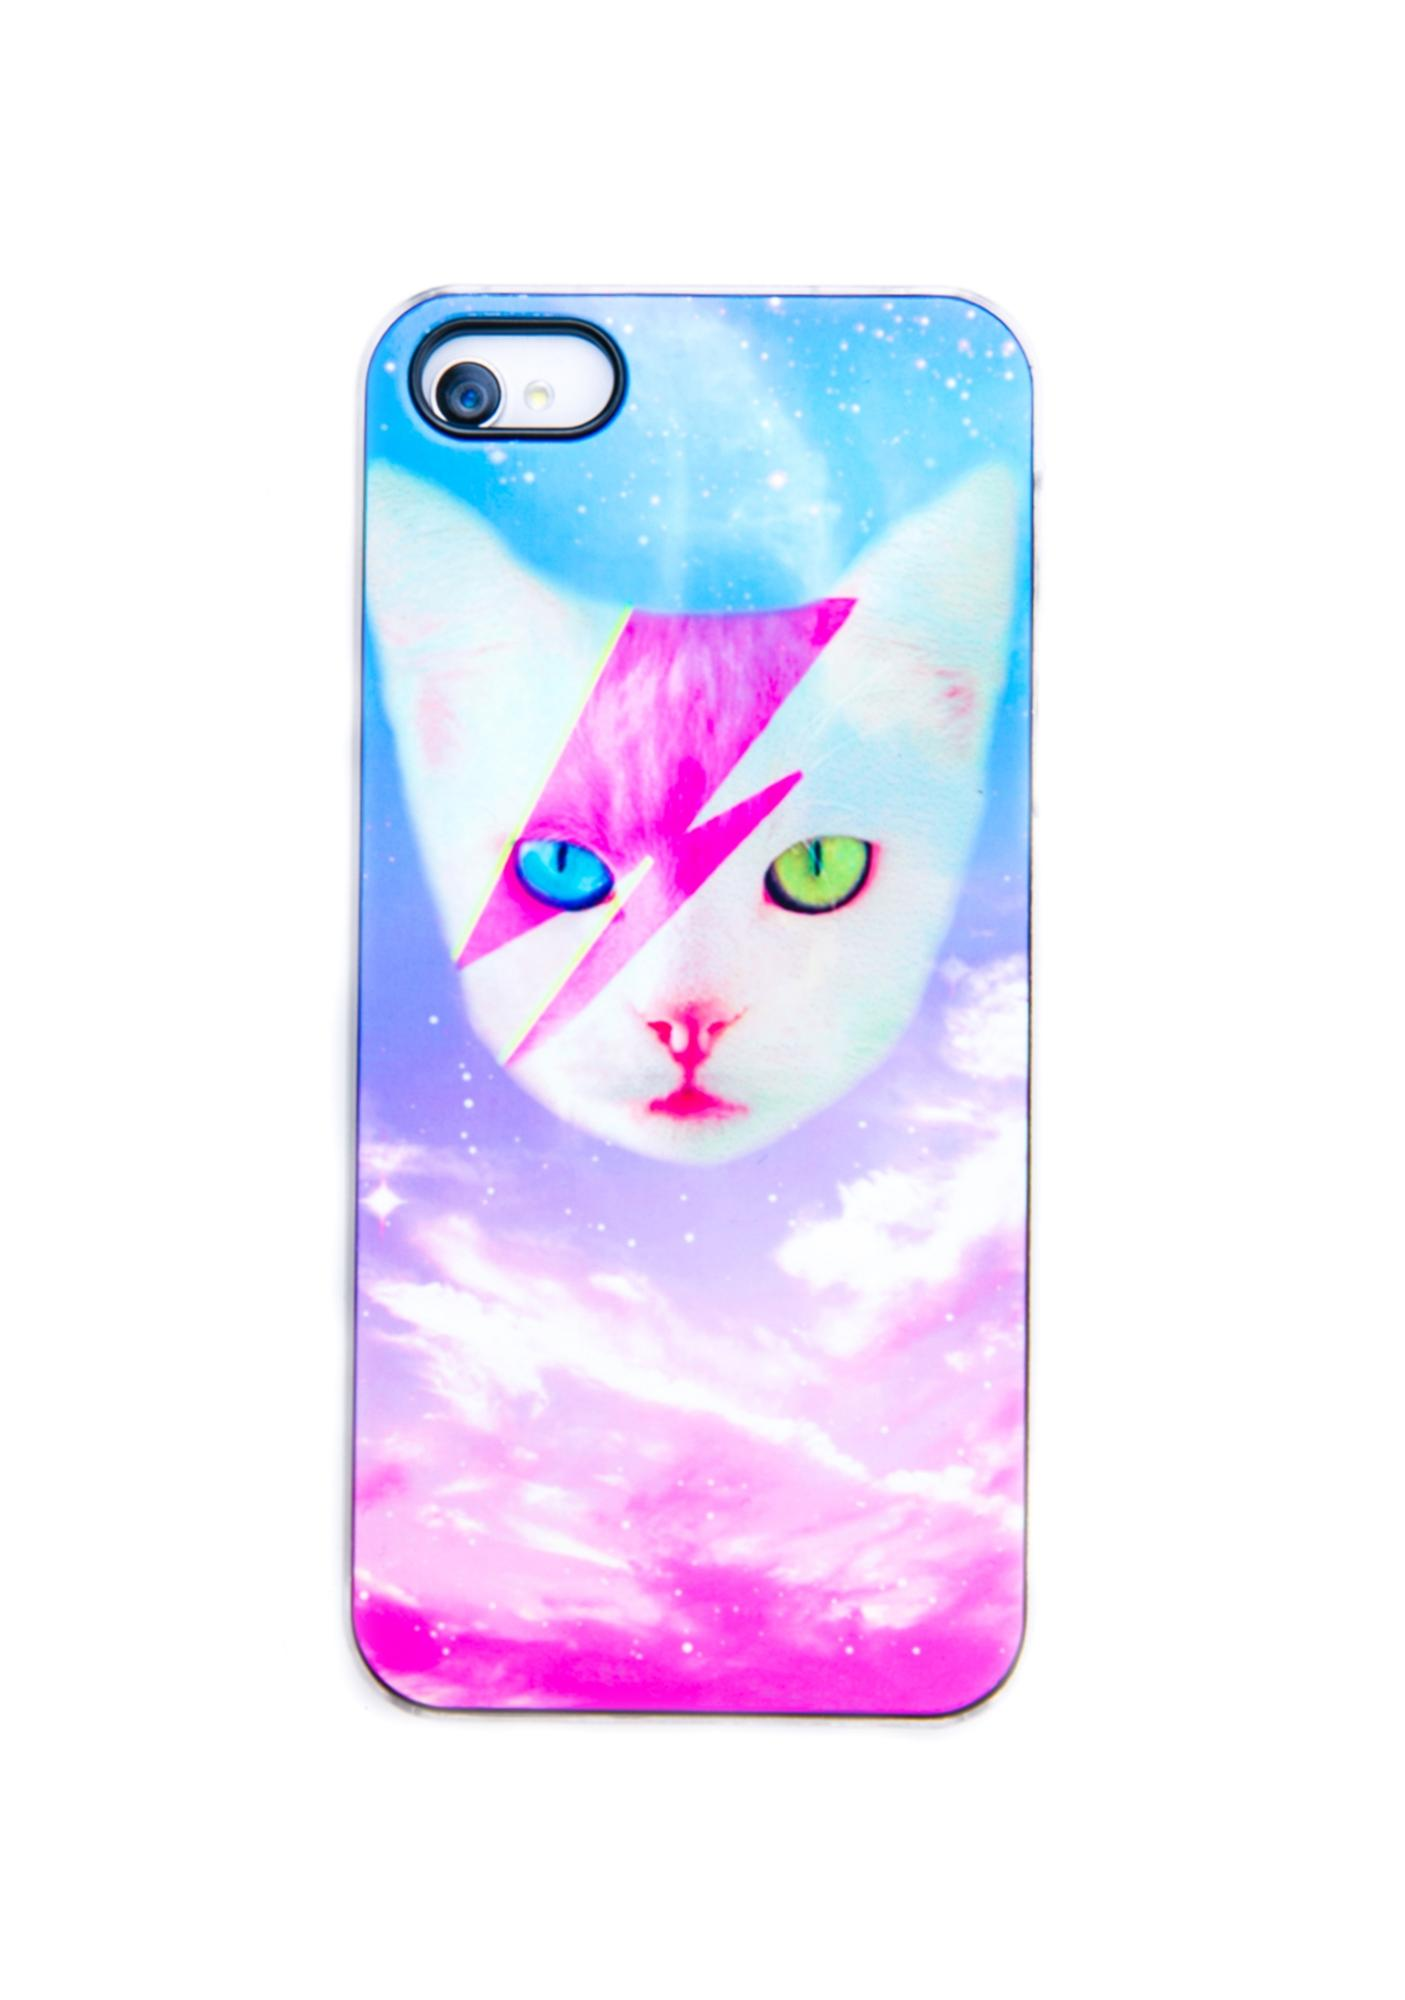 David's Meow iPhone 5 Case